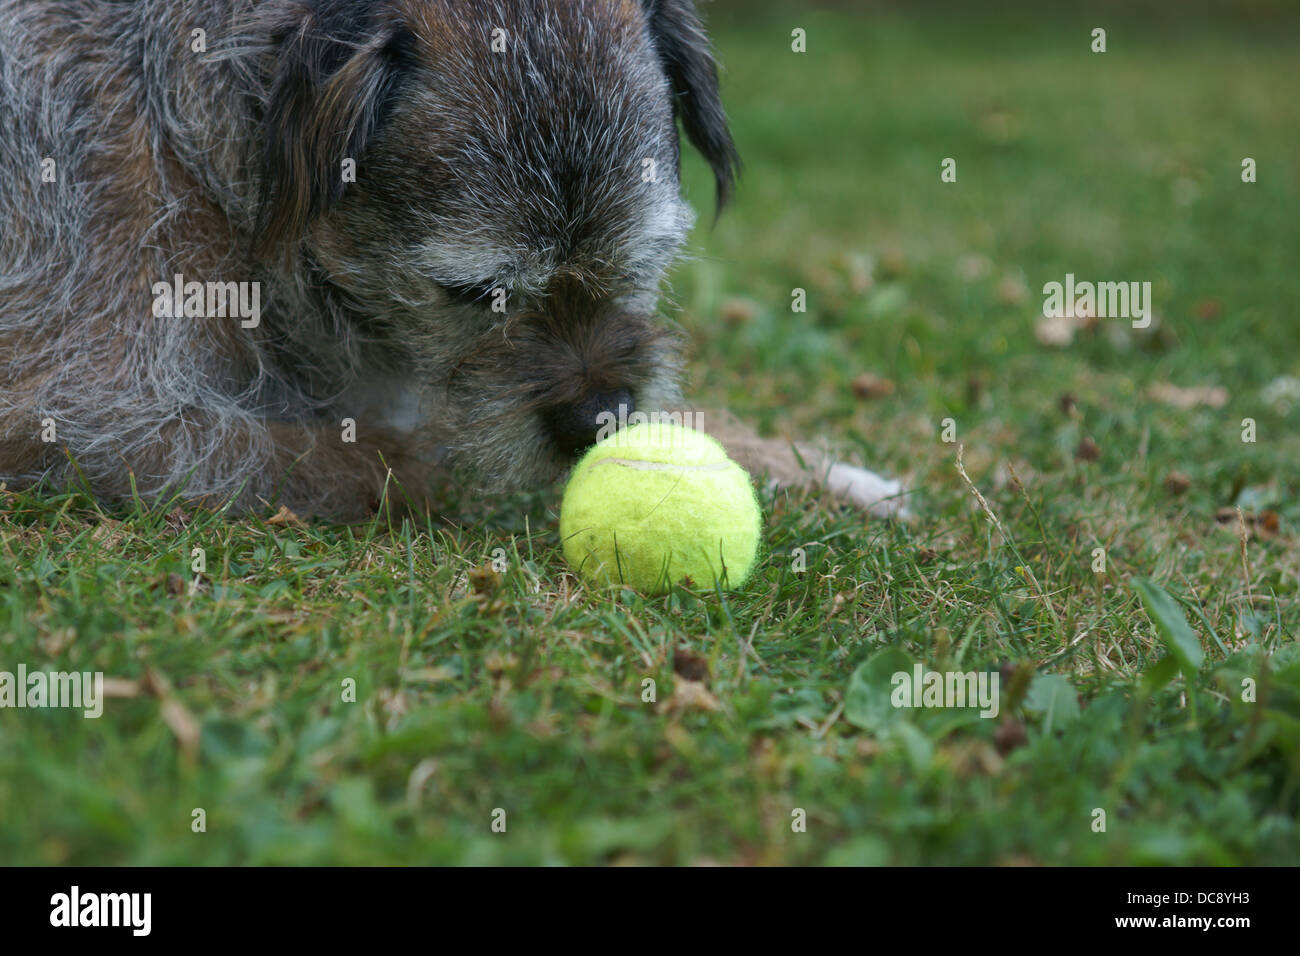 Dog Chewing Tennis Ball Border Terrier Fence Grass Border Terrier